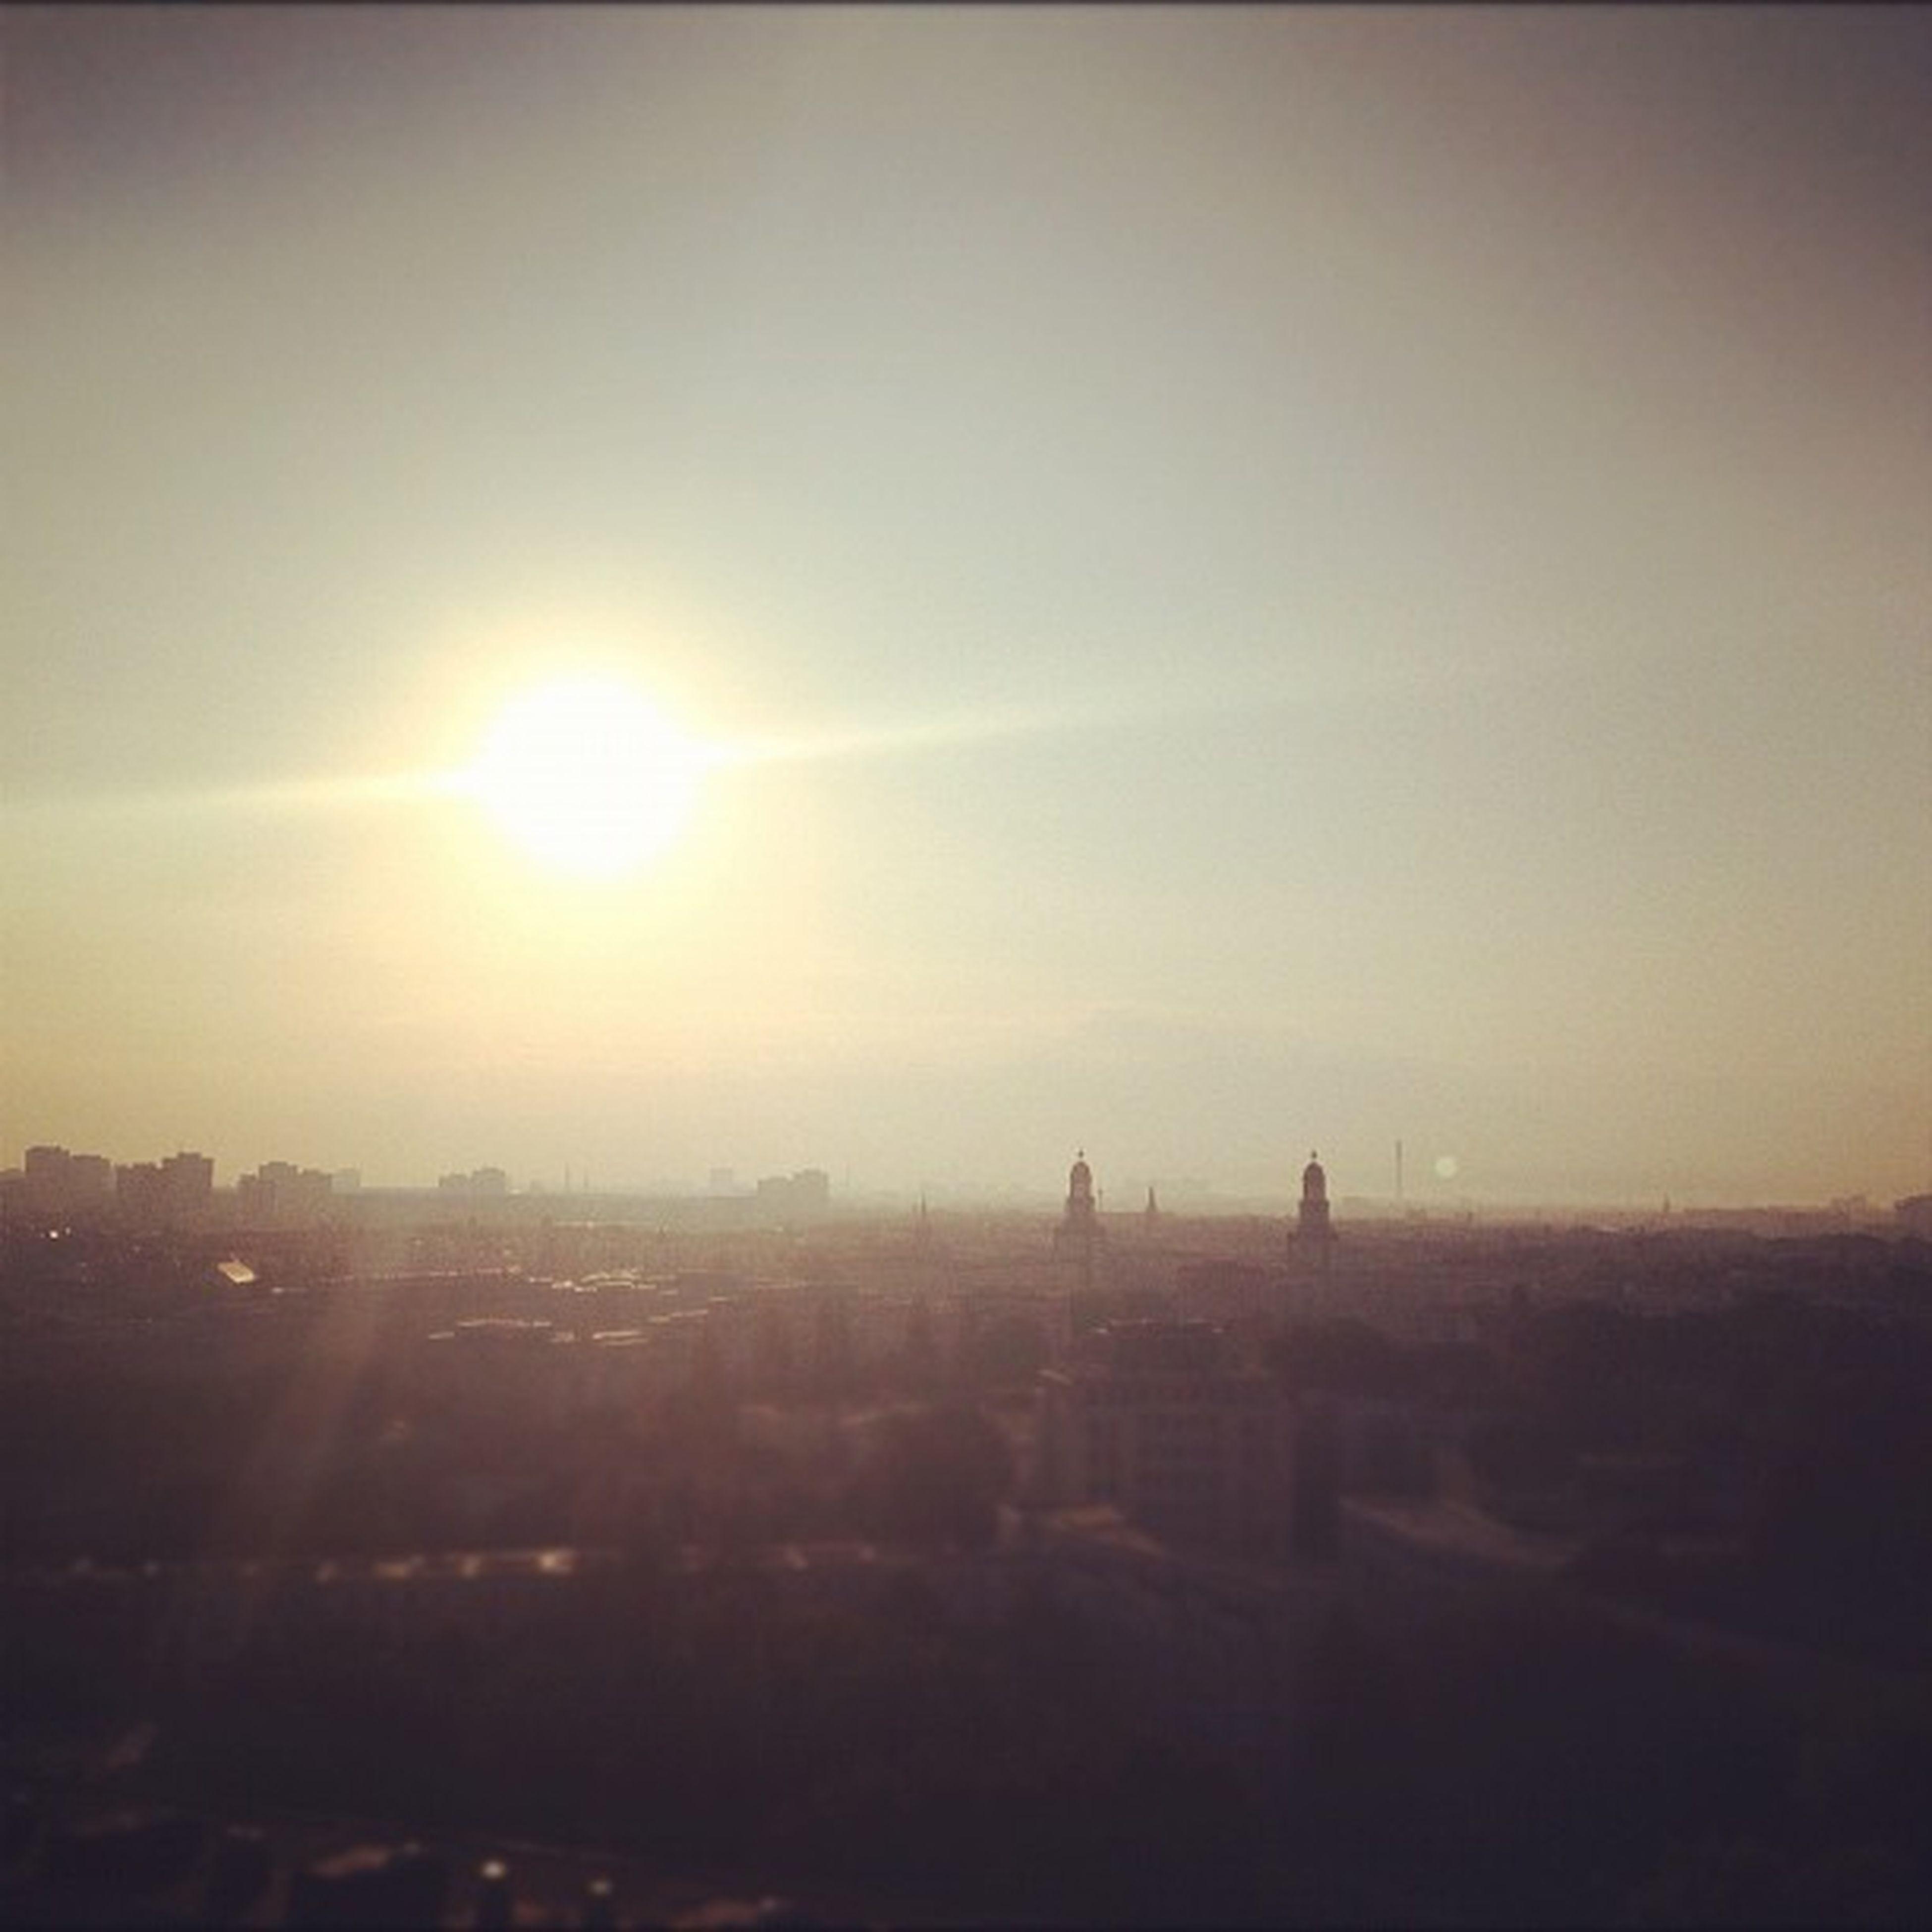 sunset, sun, cityscape, silhouette, building exterior, architecture, built structure, city, sky, sunlight, landscape, lens flare, scenics, sunbeam, clear sky, nature, copy space, outdoors, tranquility, tranquil scene